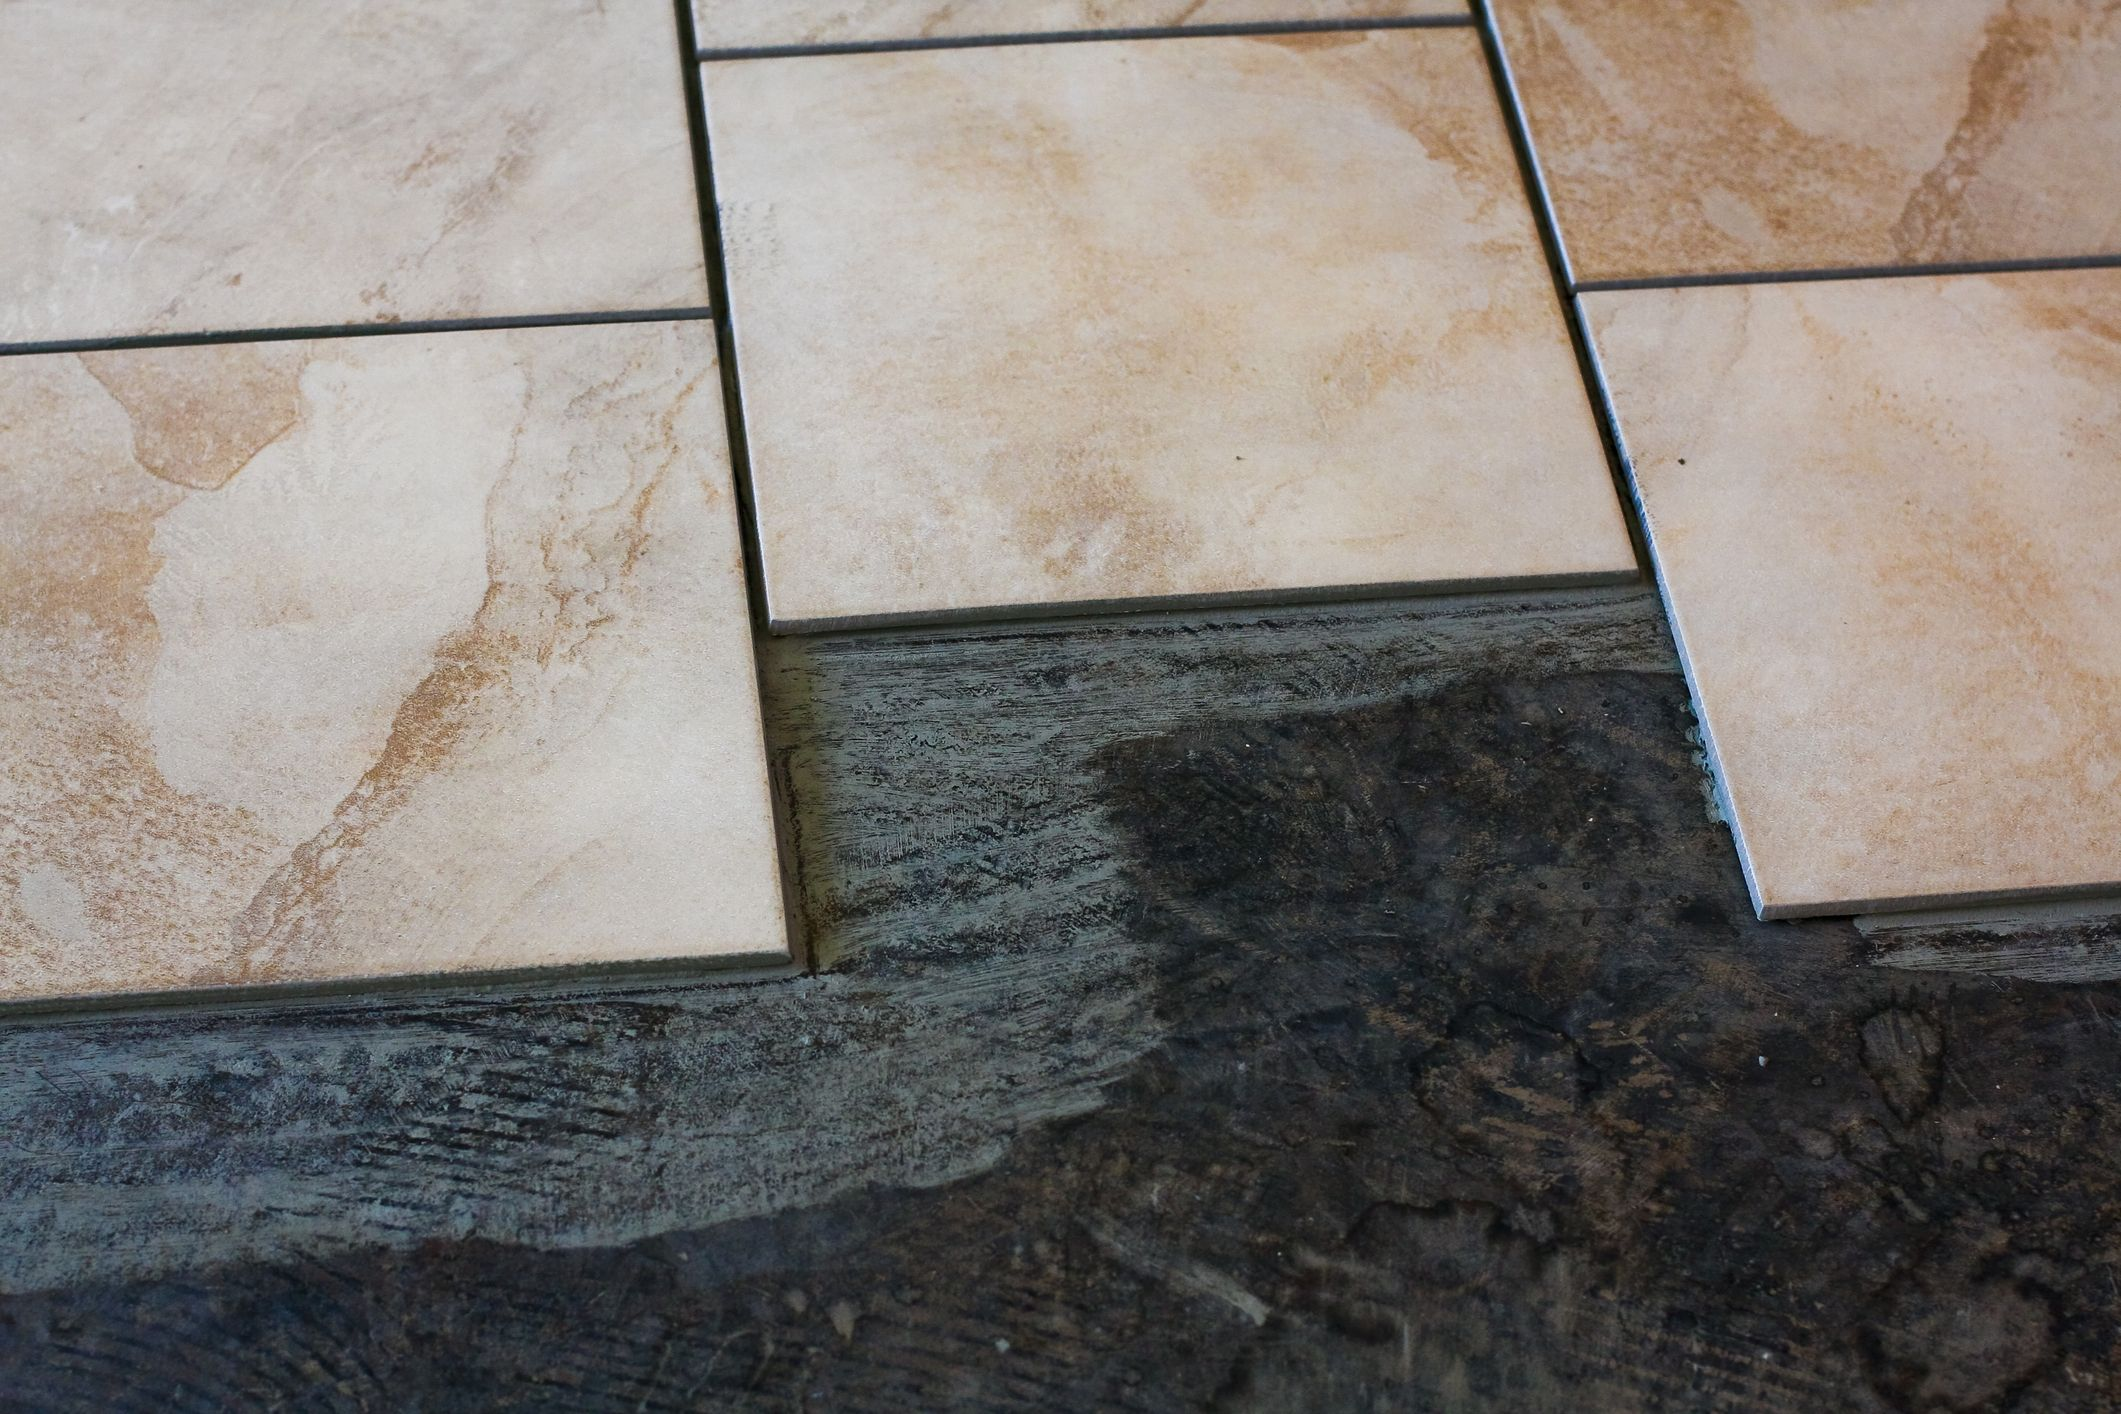 #Porcelain #Tile #Flooring - Porcelain tiles, in general, are harder than #ceramic #tiles and